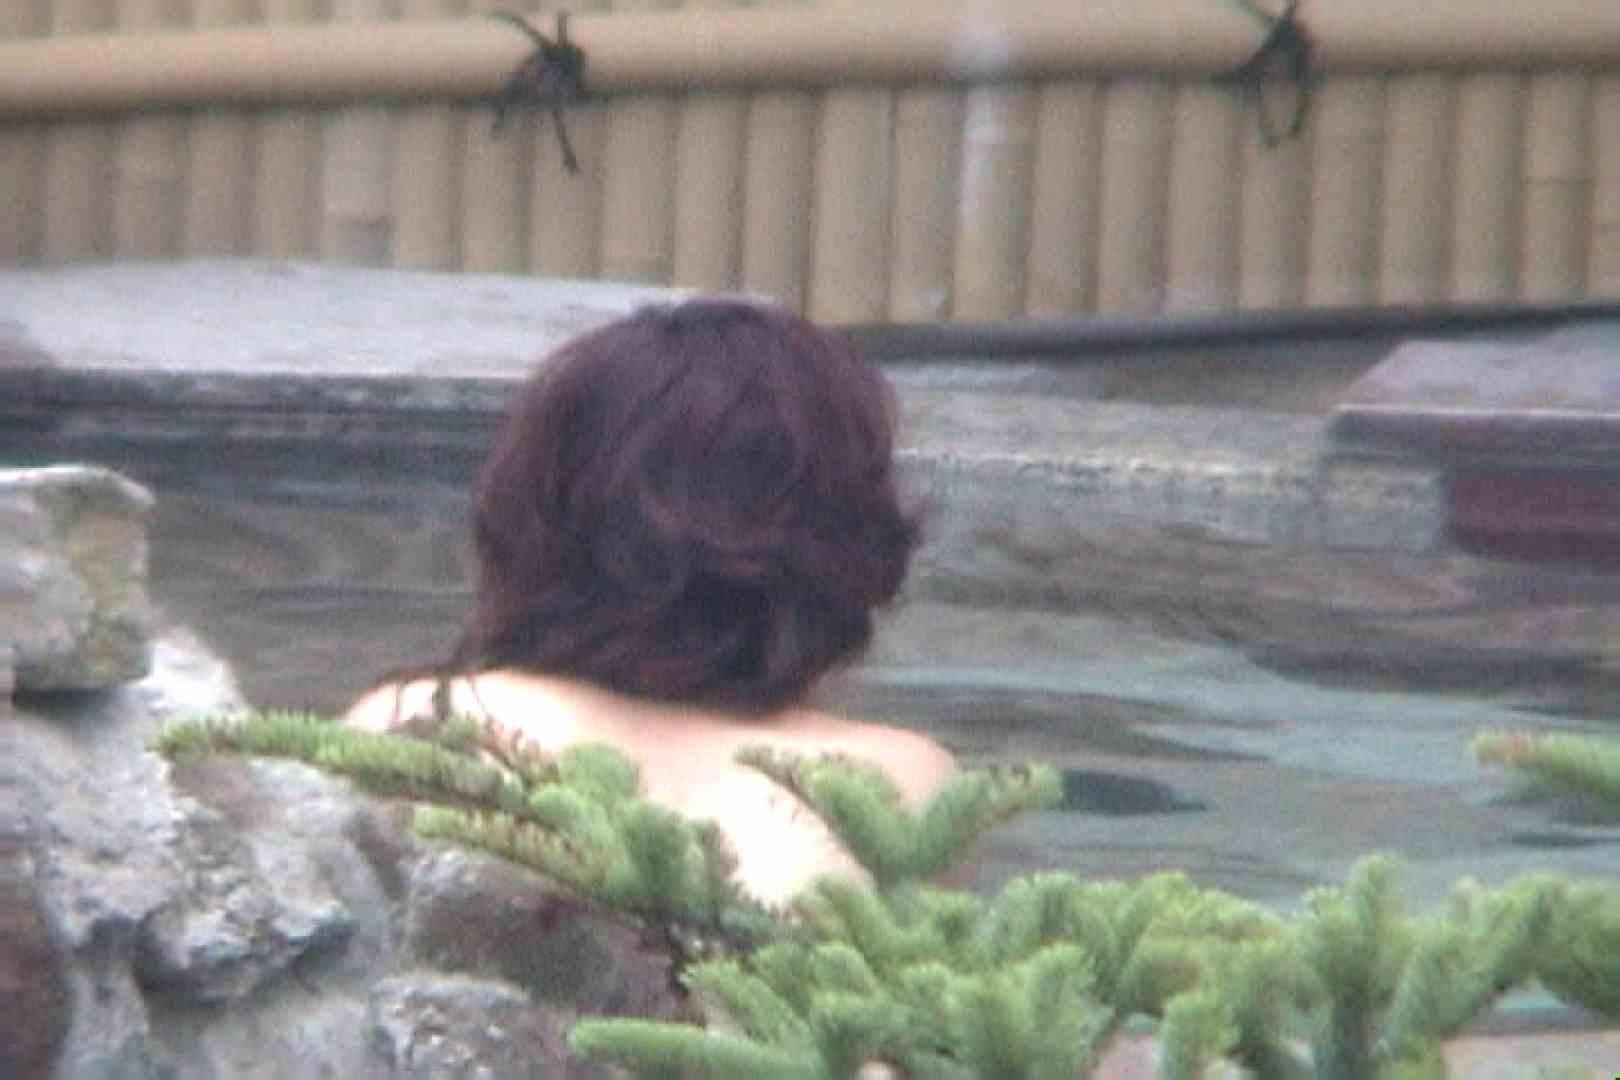 Aquaな露天風呂Vol.81【VIP限定】 OLセックス | 盗撮  97画像 85